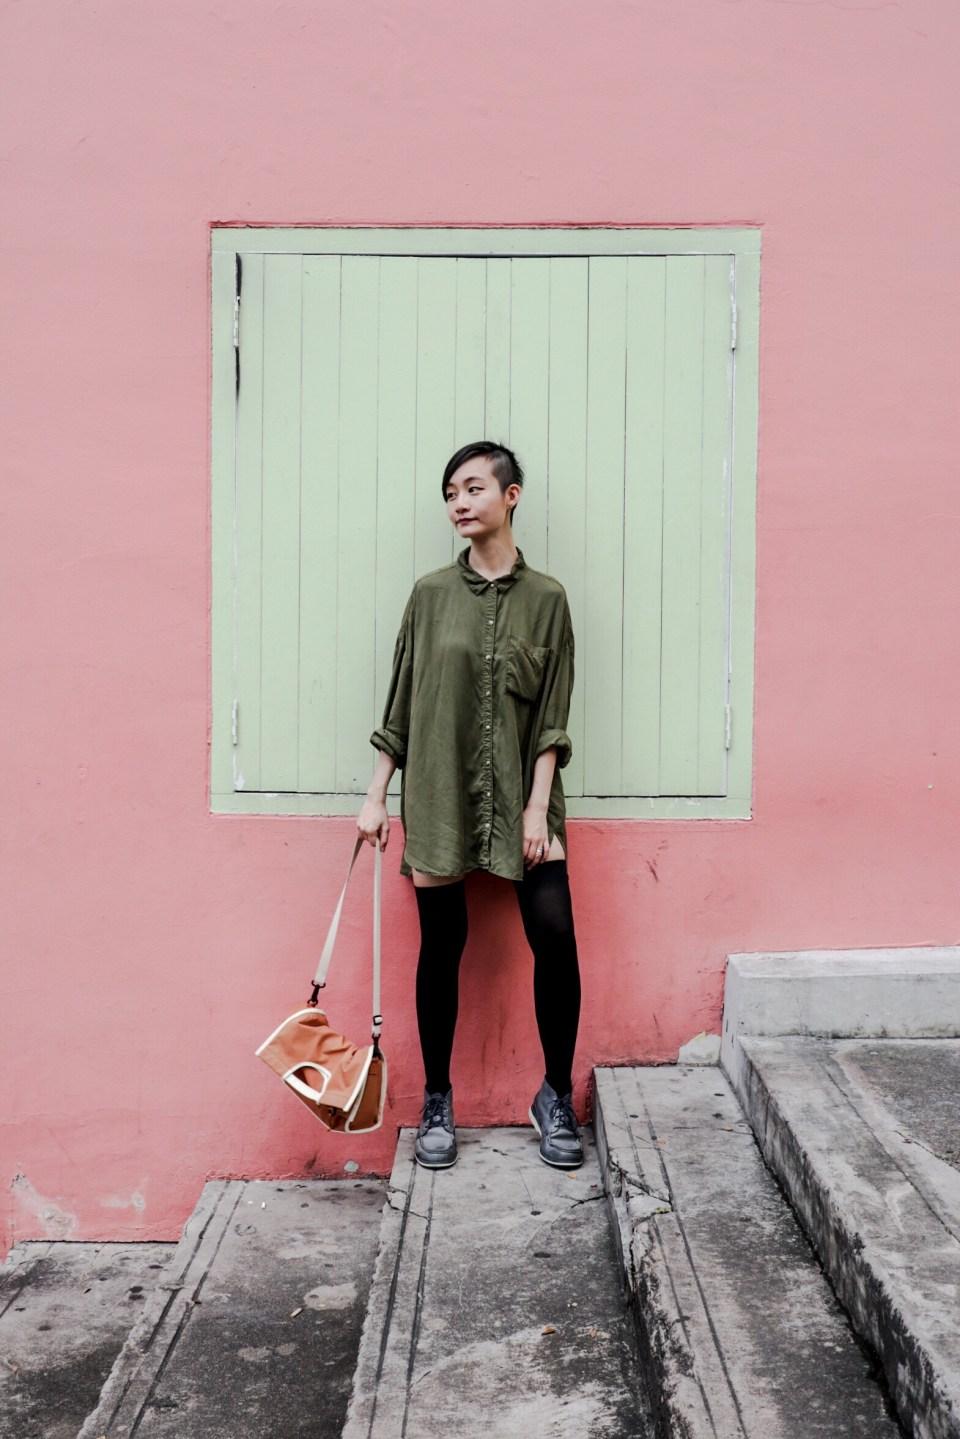 outfit of the day: zara tencel lyocell shirt dress, we love colors black thigh high socks, timberland blue chukka boots, rawrow convertible satchel.